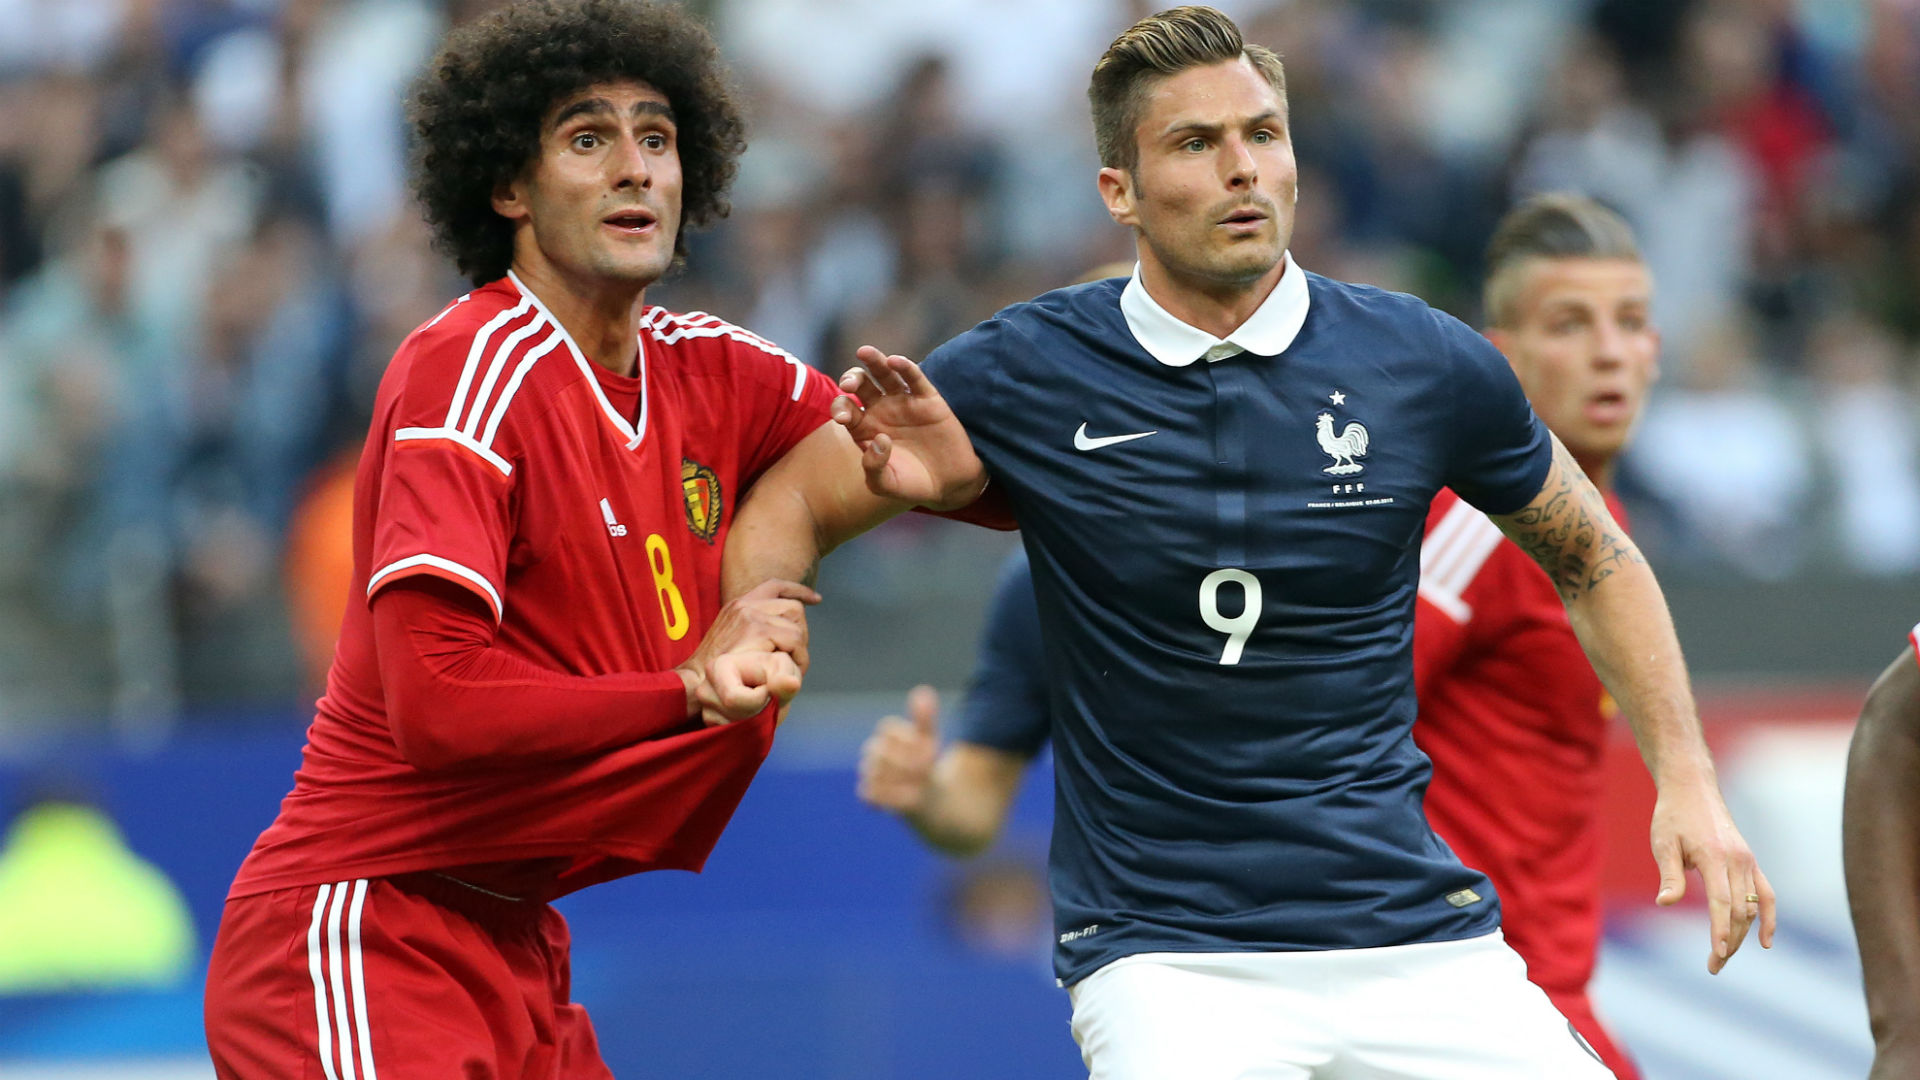 Olivier Giroud Marouane Fellaini France Belgium 2015